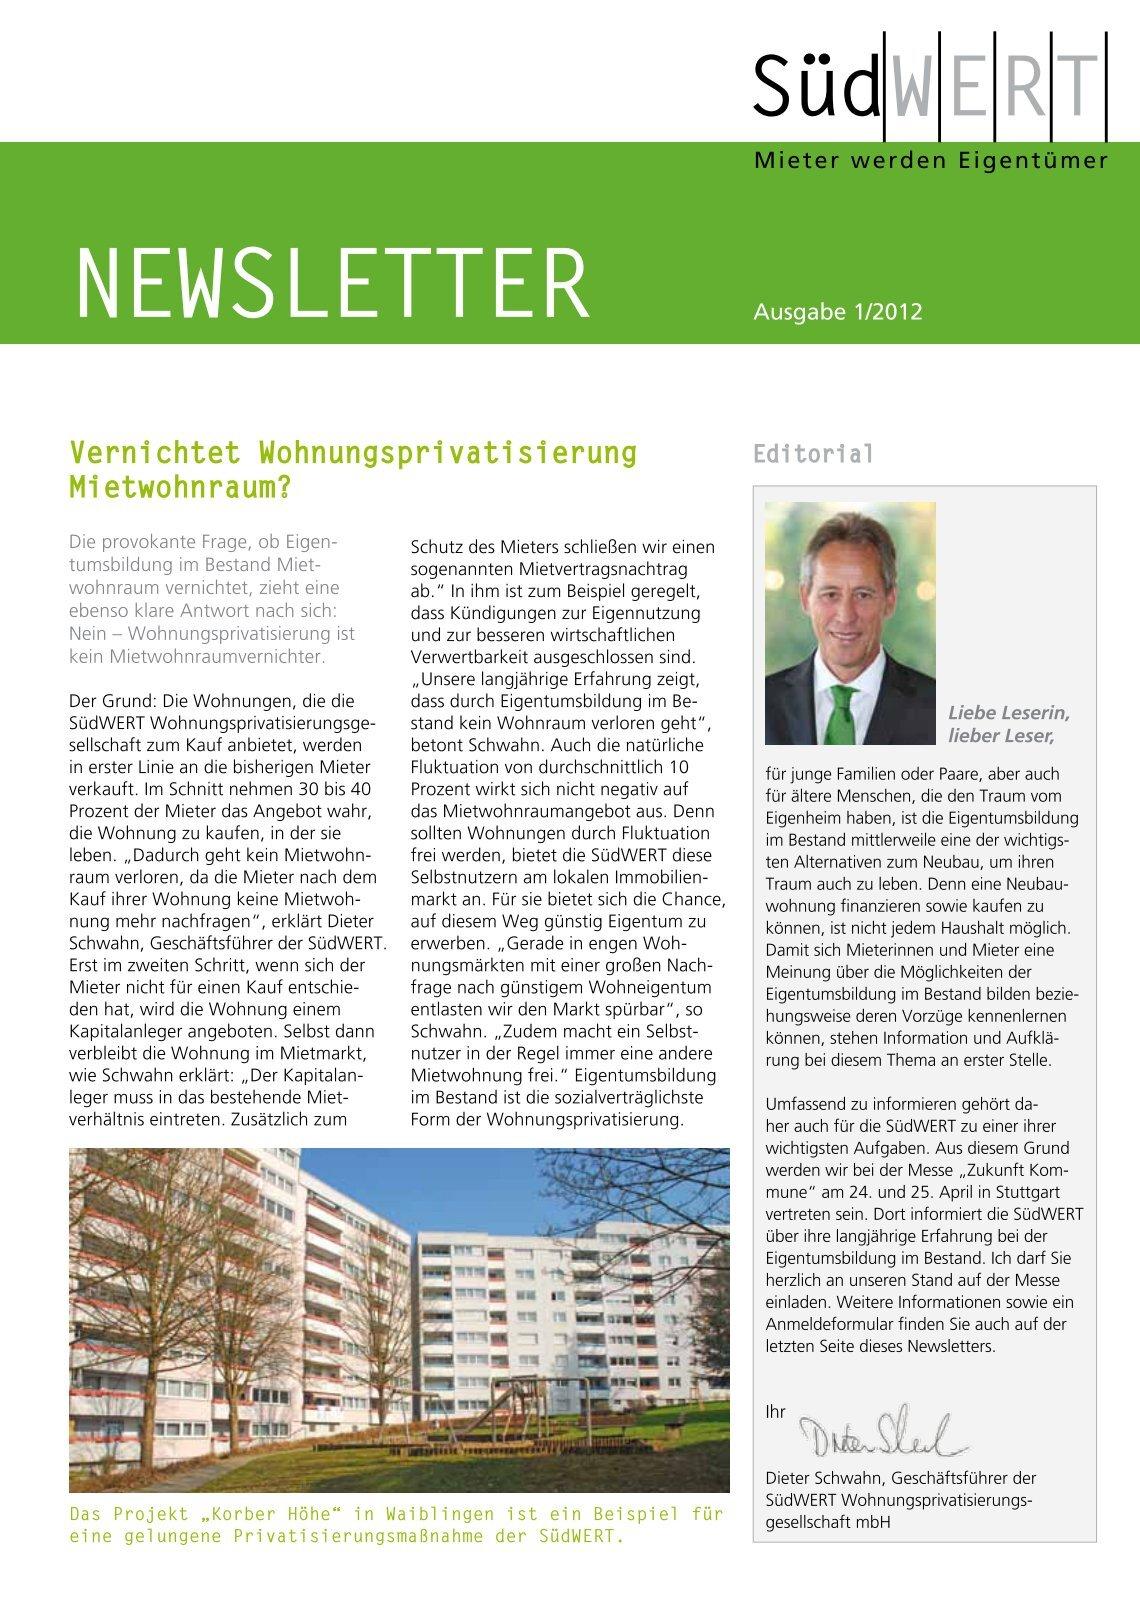 2 free Magazines from SUEDWERT.DE